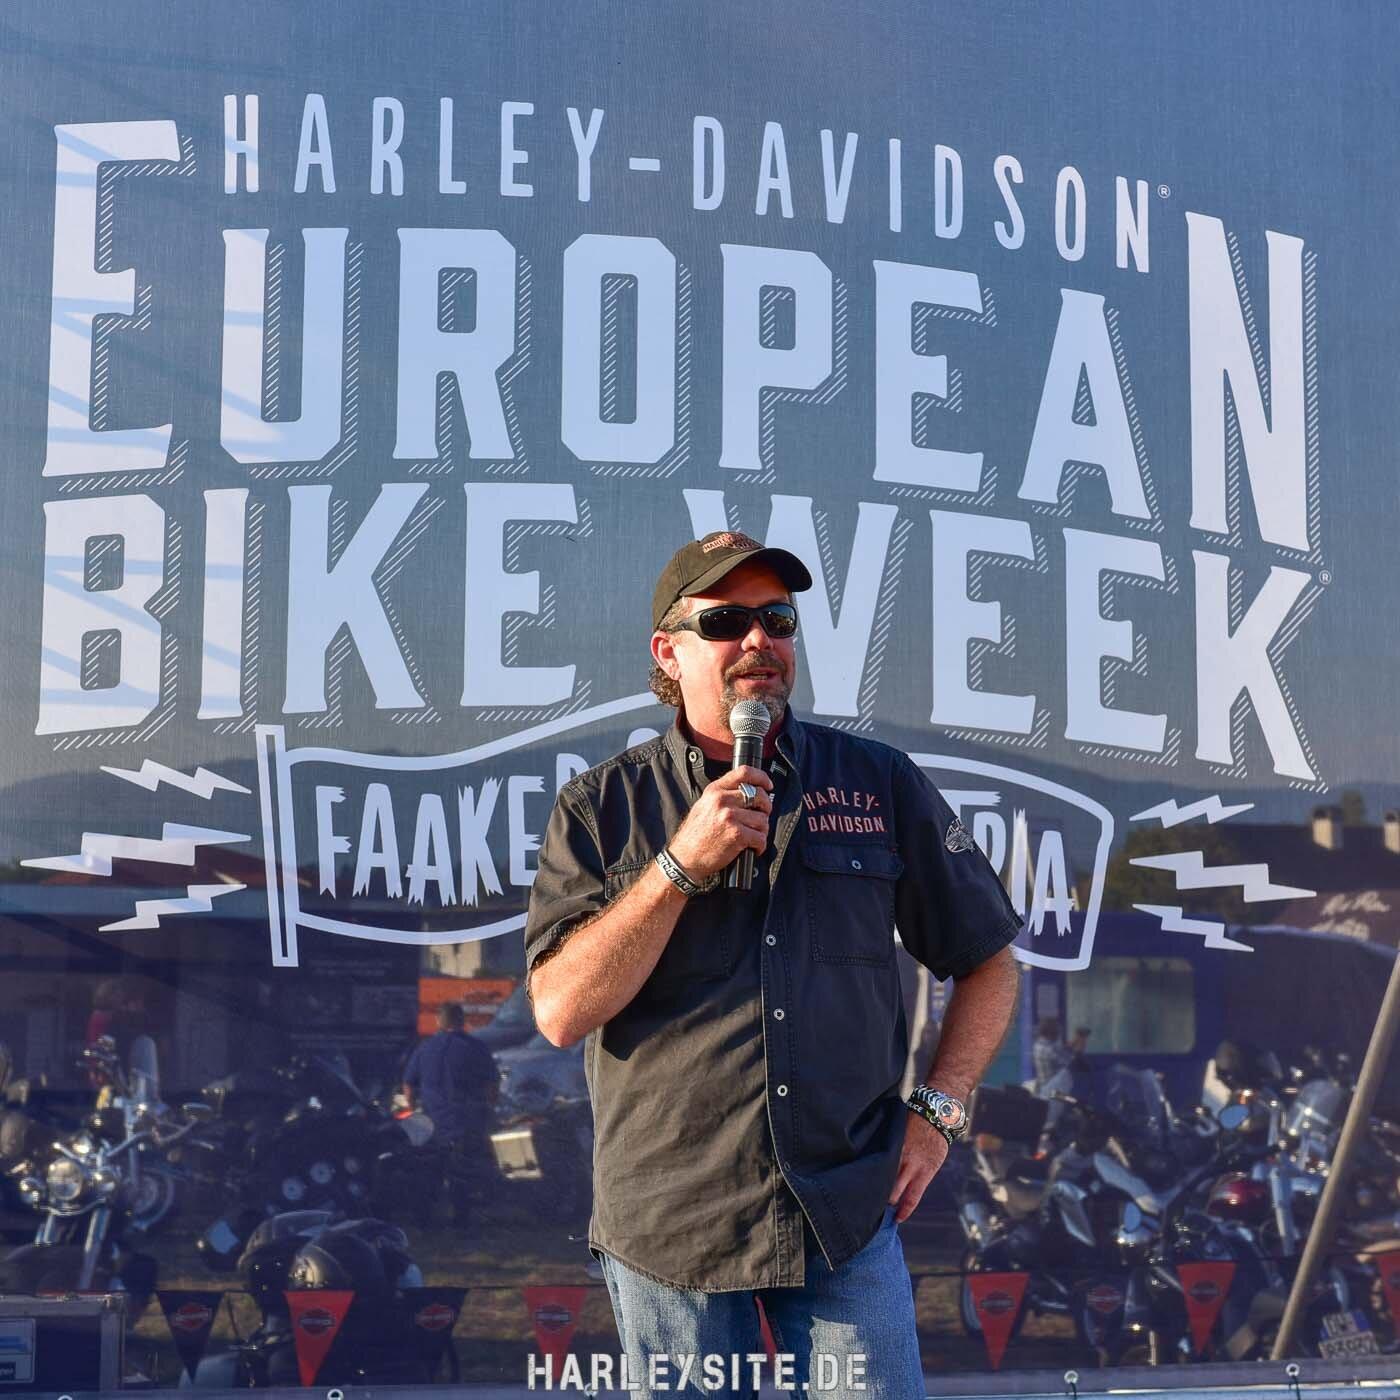 European-Bike-Week-0694